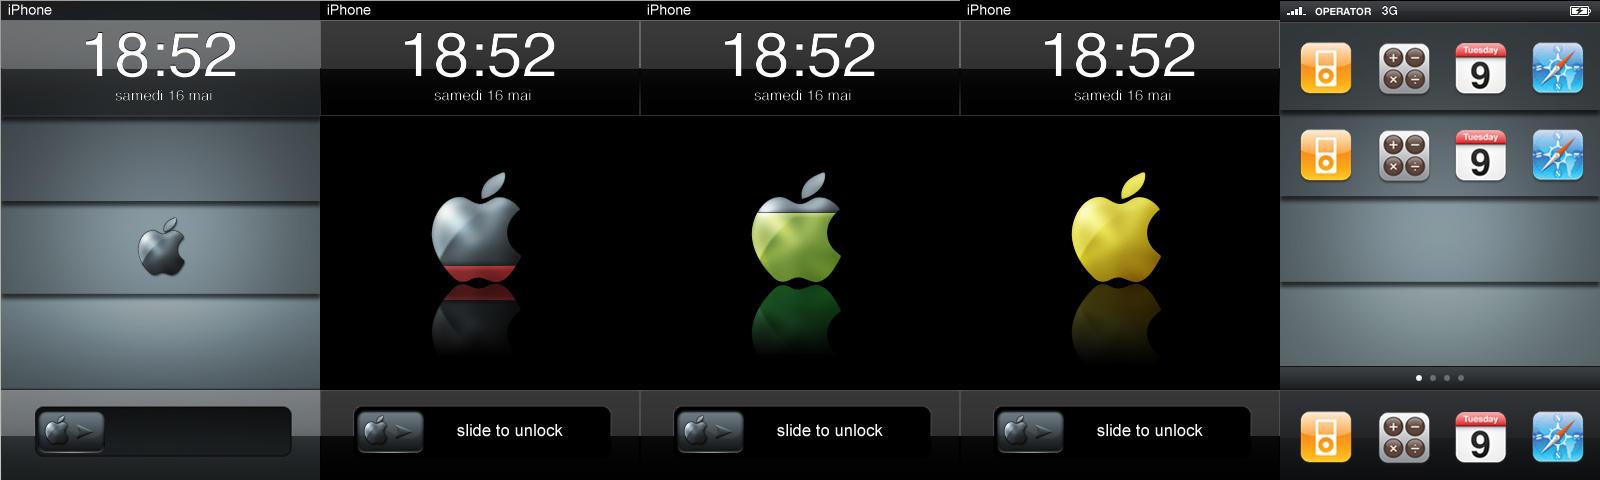 Unlock Iphone After Death